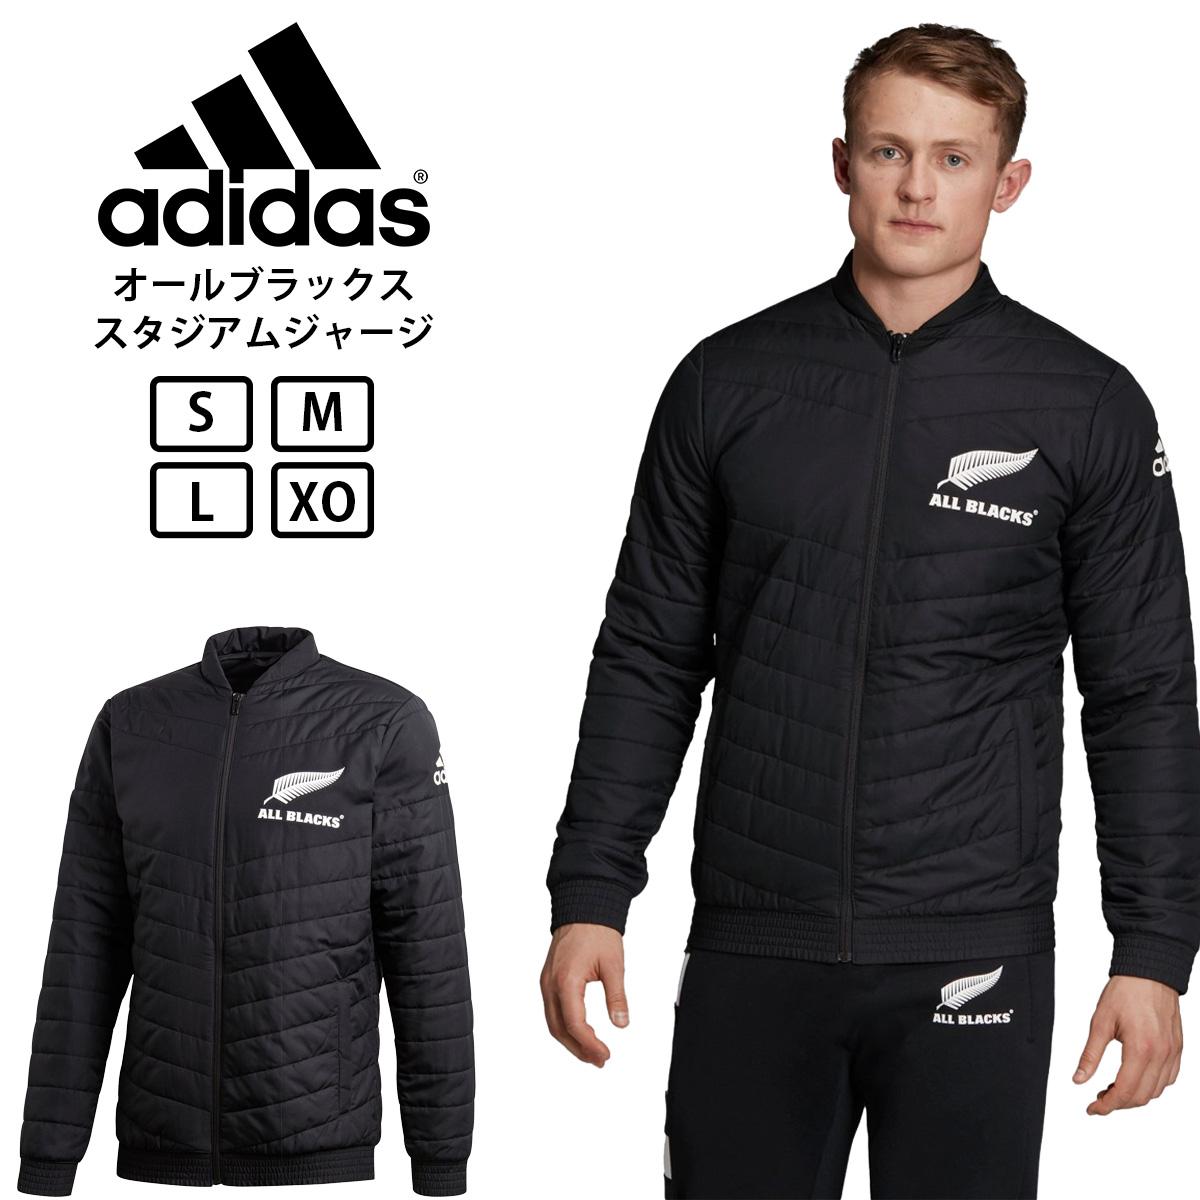 adidas アディダス オールブラックス ラグビー サポータースタジアム ジャケット メンズ レディース